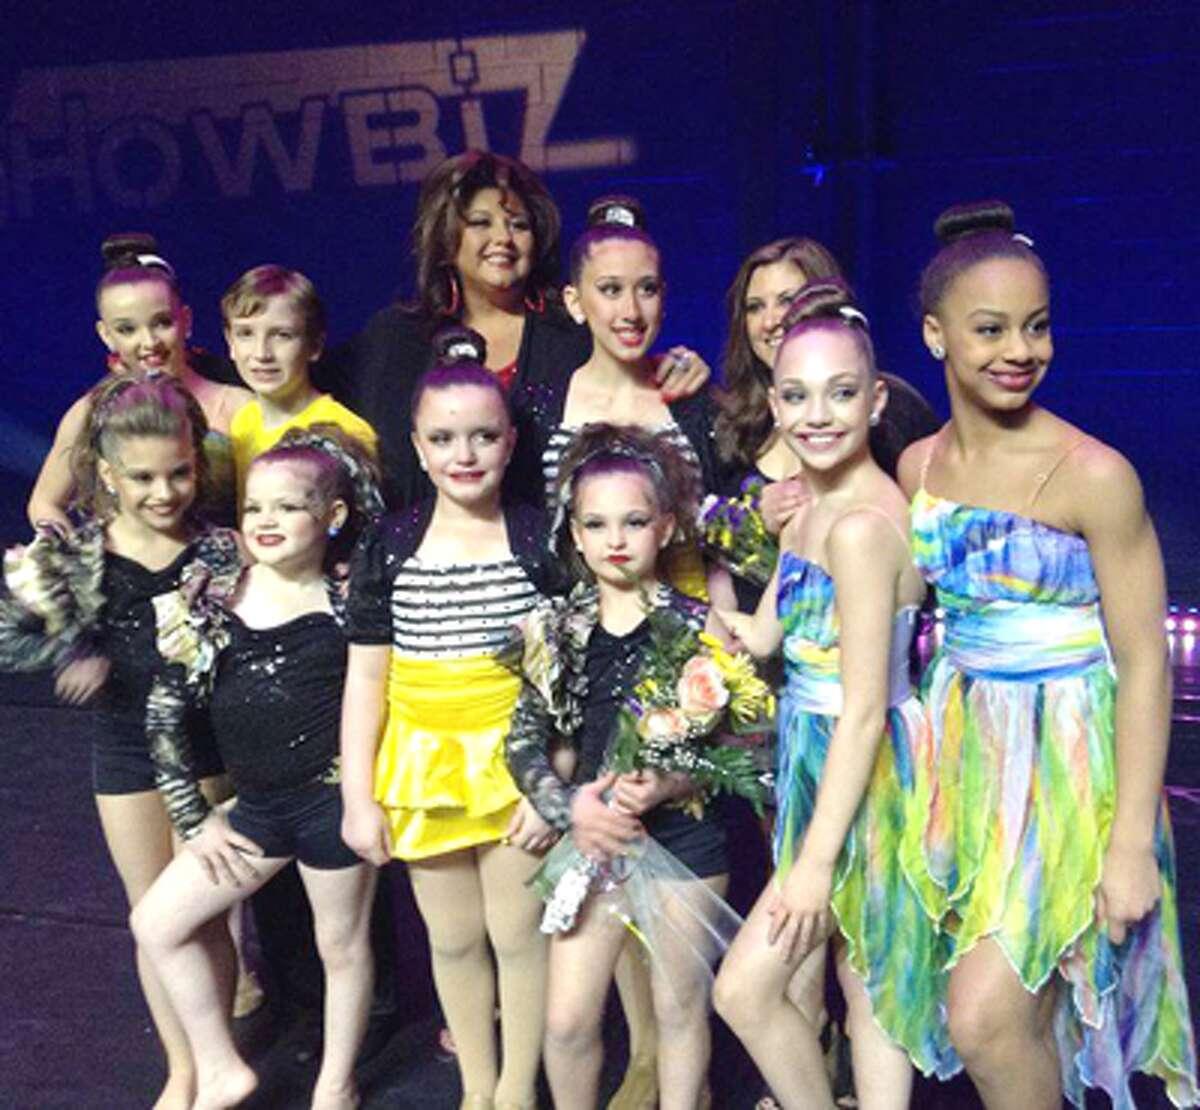 Dancers from the That's ShowBiz! dance studio in Shelton.